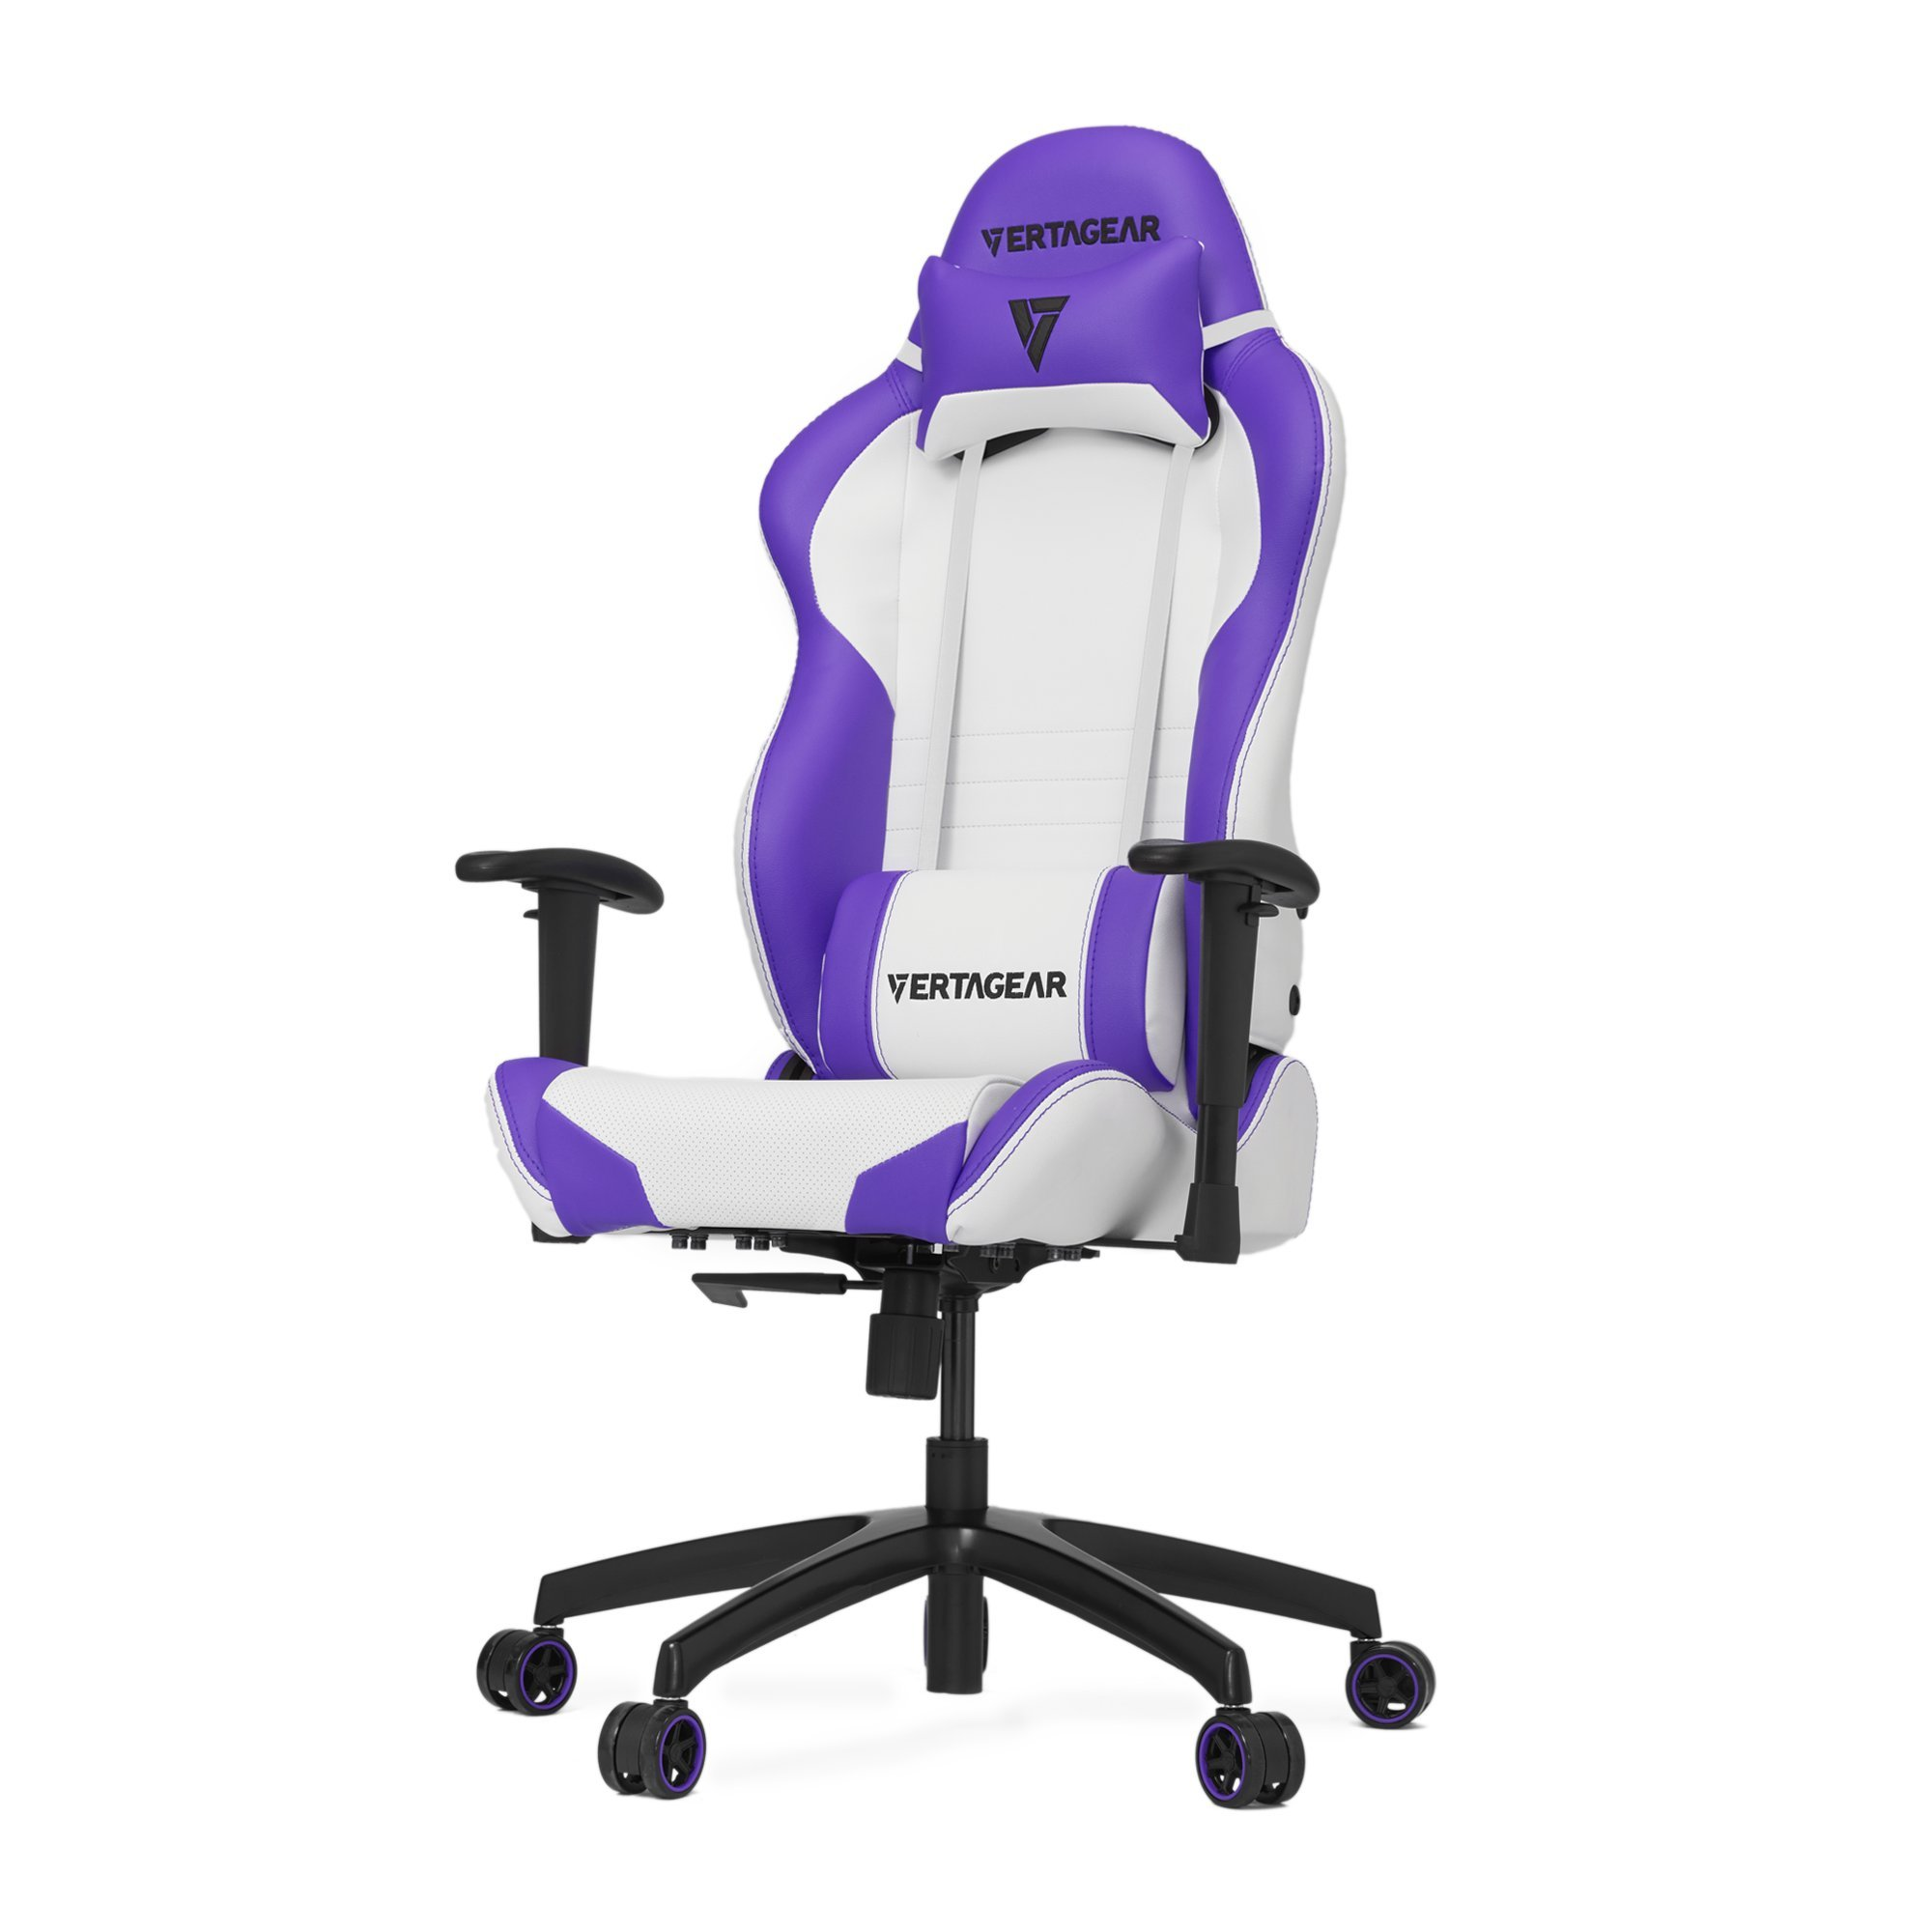 Vertagear SL2000_WP S-Line 2000 Racing Series Gaming Chair, Large, White/Purple